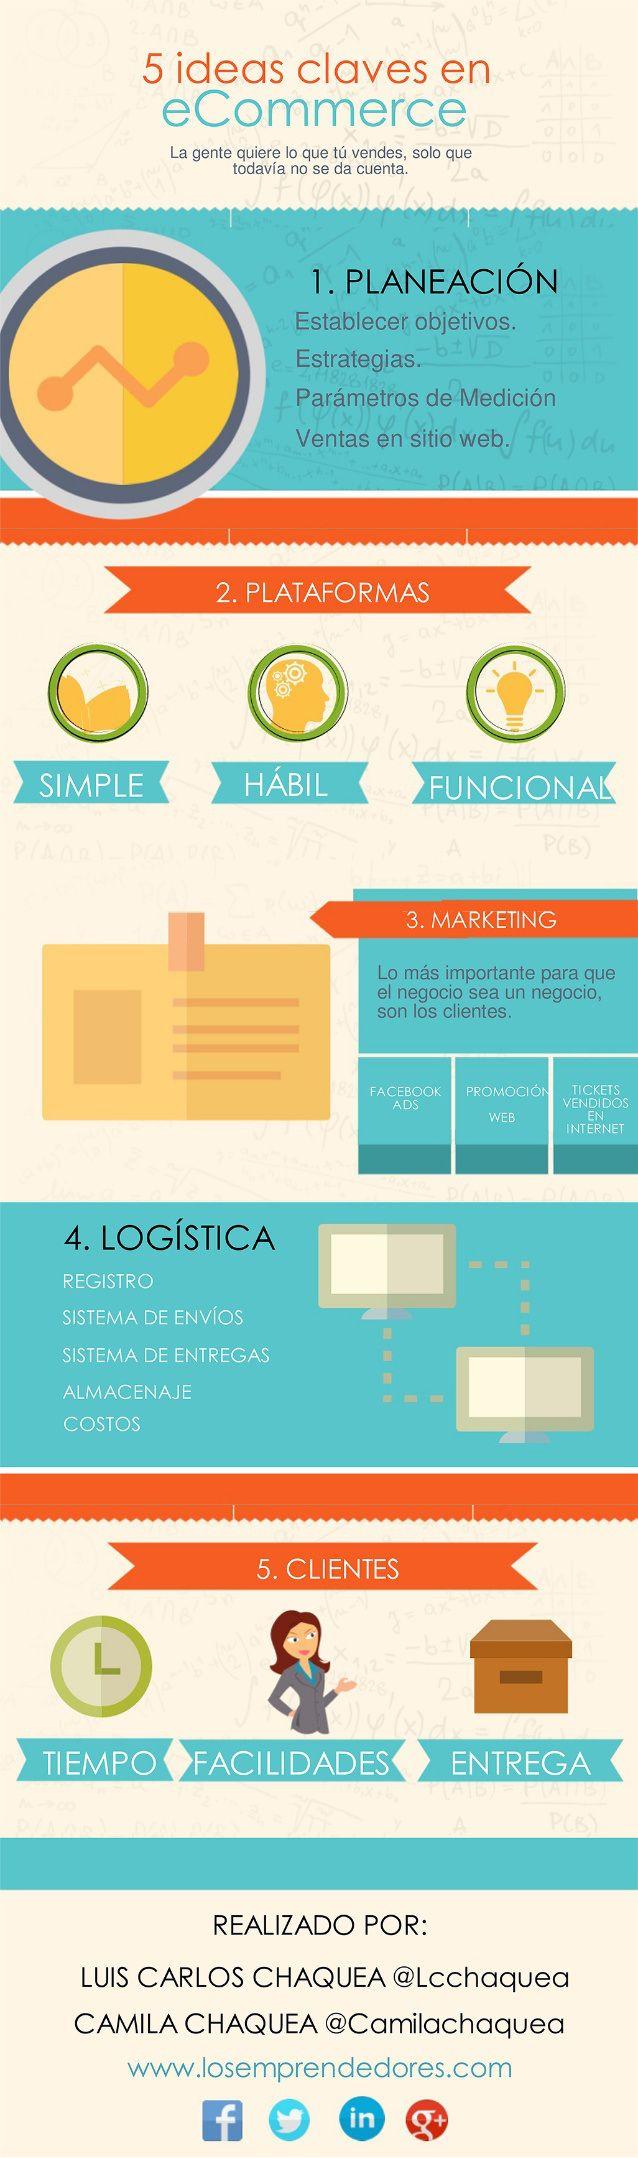 5 ideas clave para comercio electrónico #infografia #infographic #ecommerce